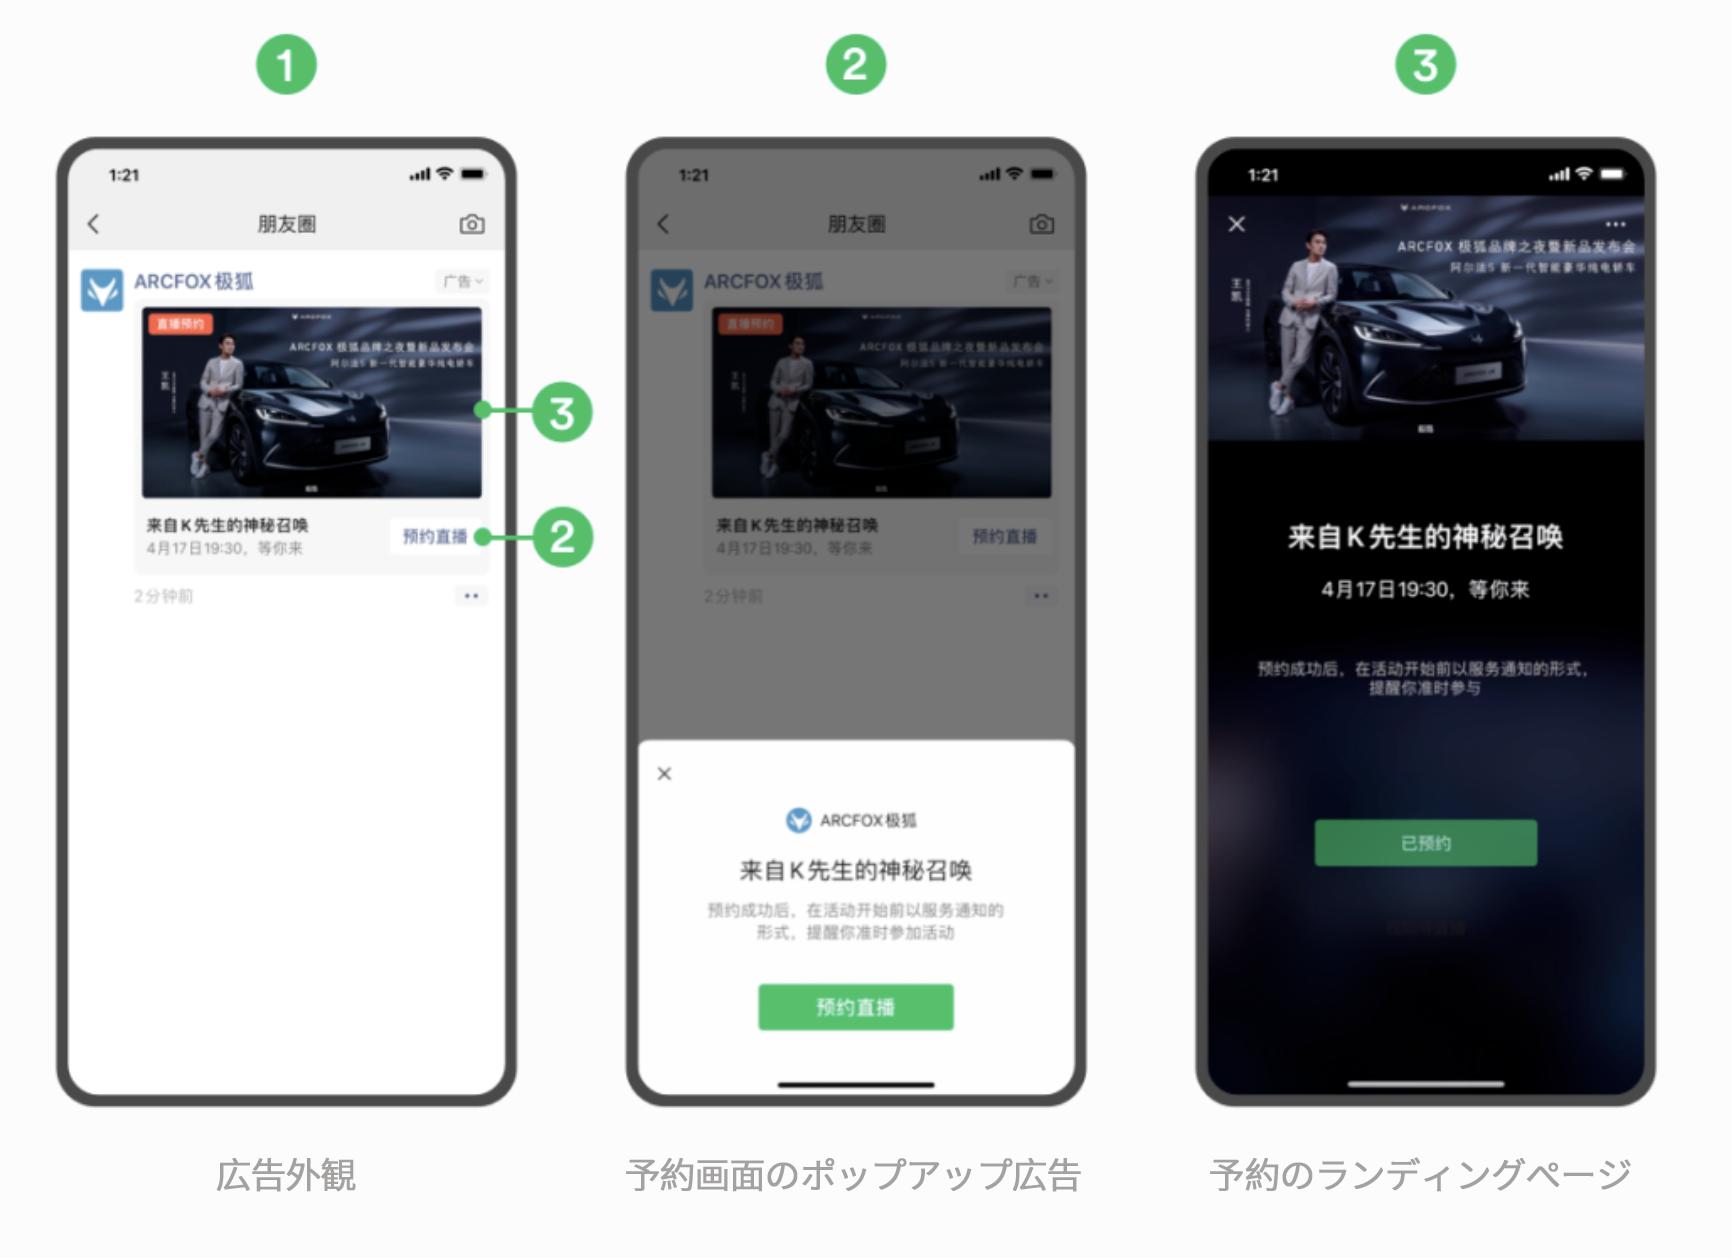 Wechat広告と「视频号」ミニプログラムのマーケティング能力分析